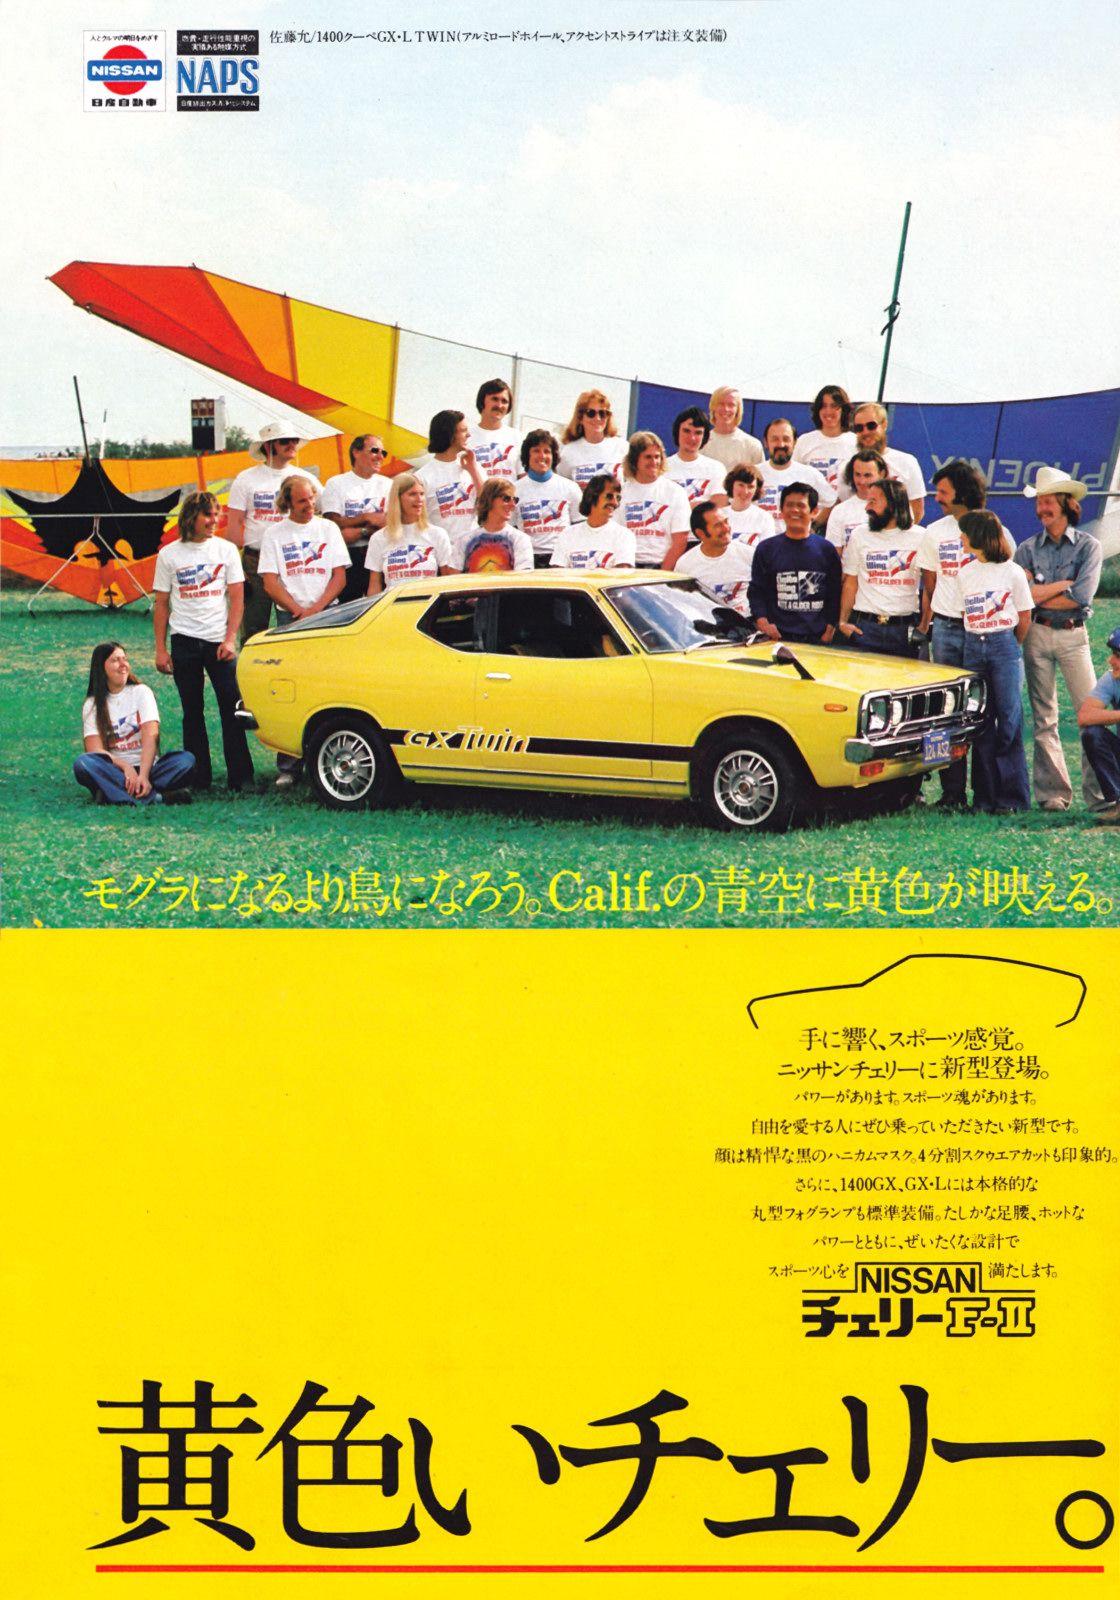 Nissan チェリー 1977年 日産 パルサー 日産自動車 ラリーカー